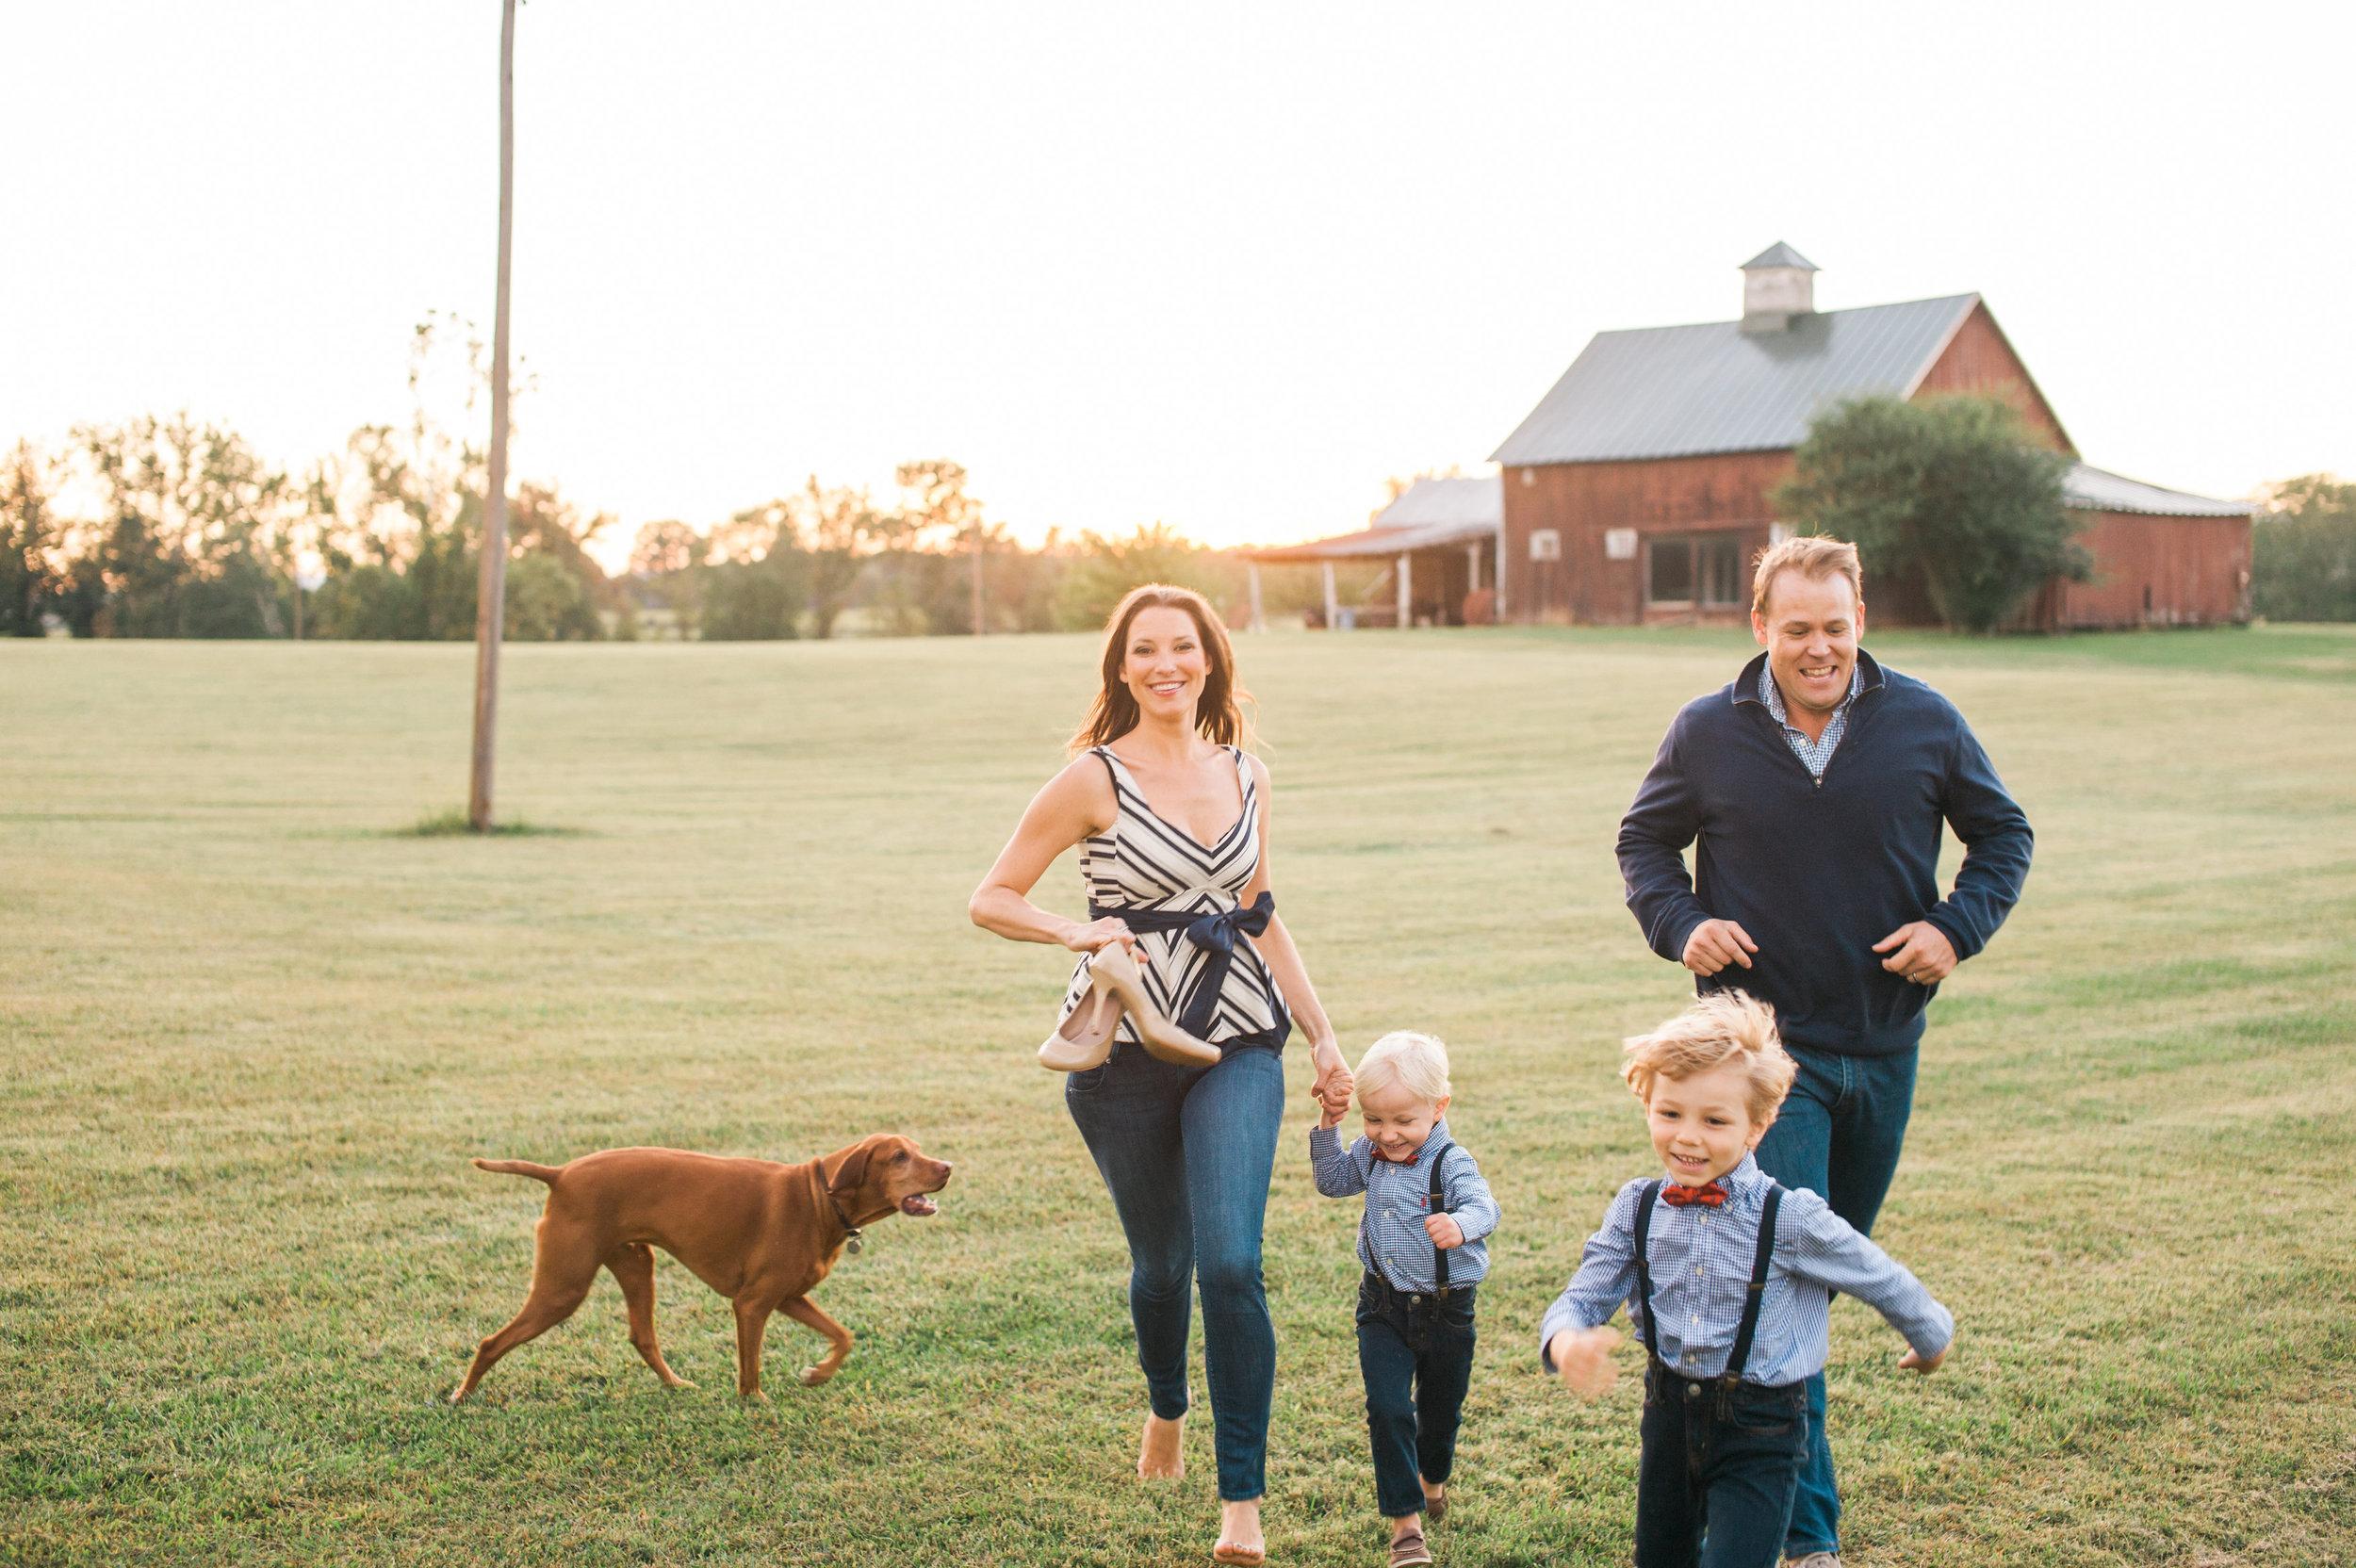 middleburgfamilyphotographer